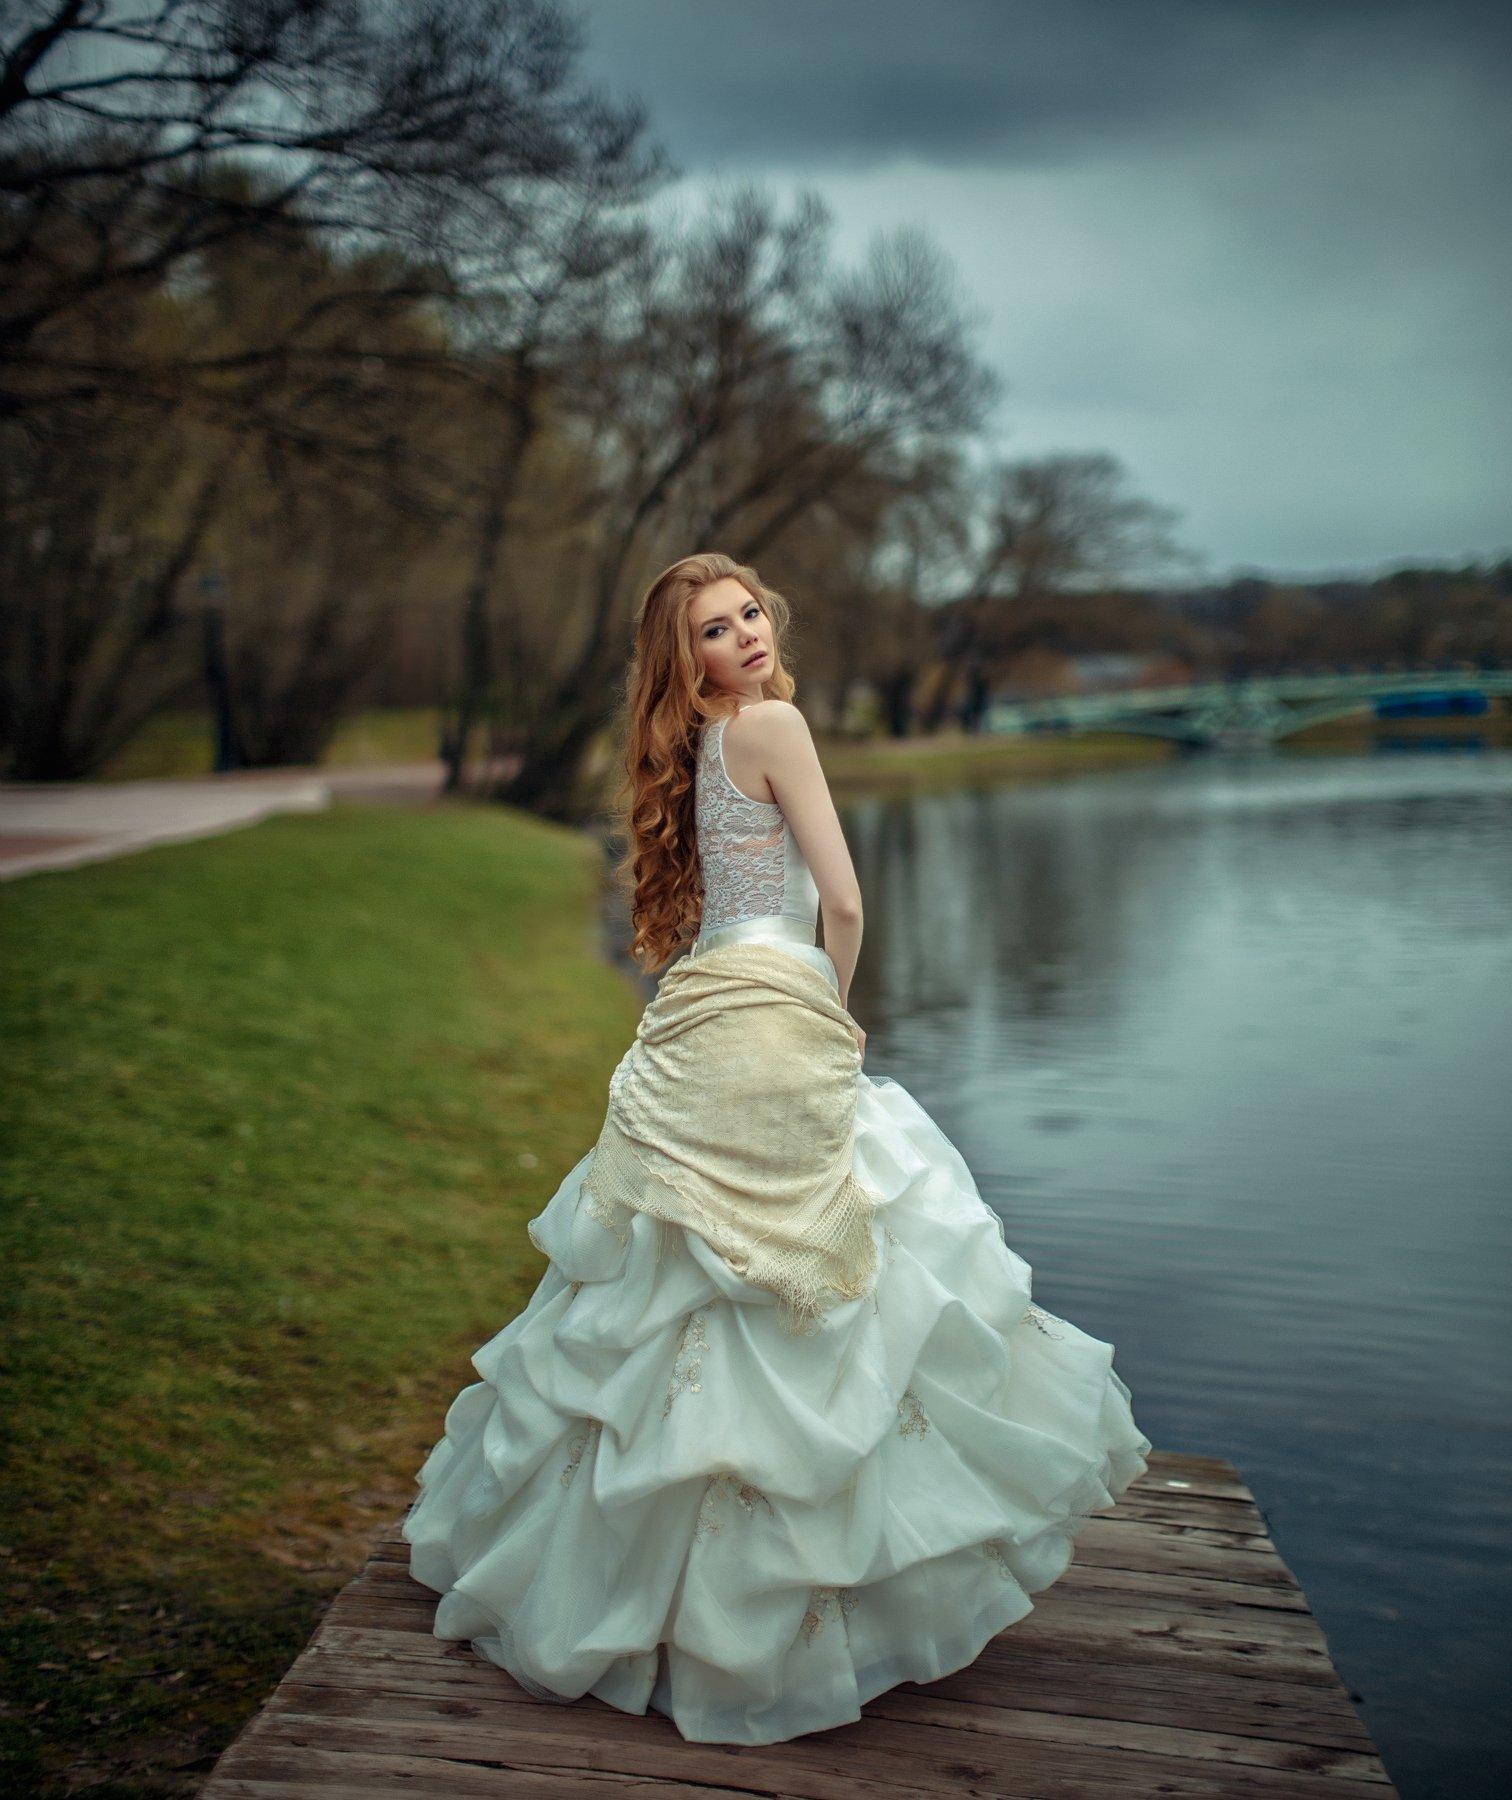 #portrait, #beautiful, #model, #russia, #moscow, Hakan Erenler